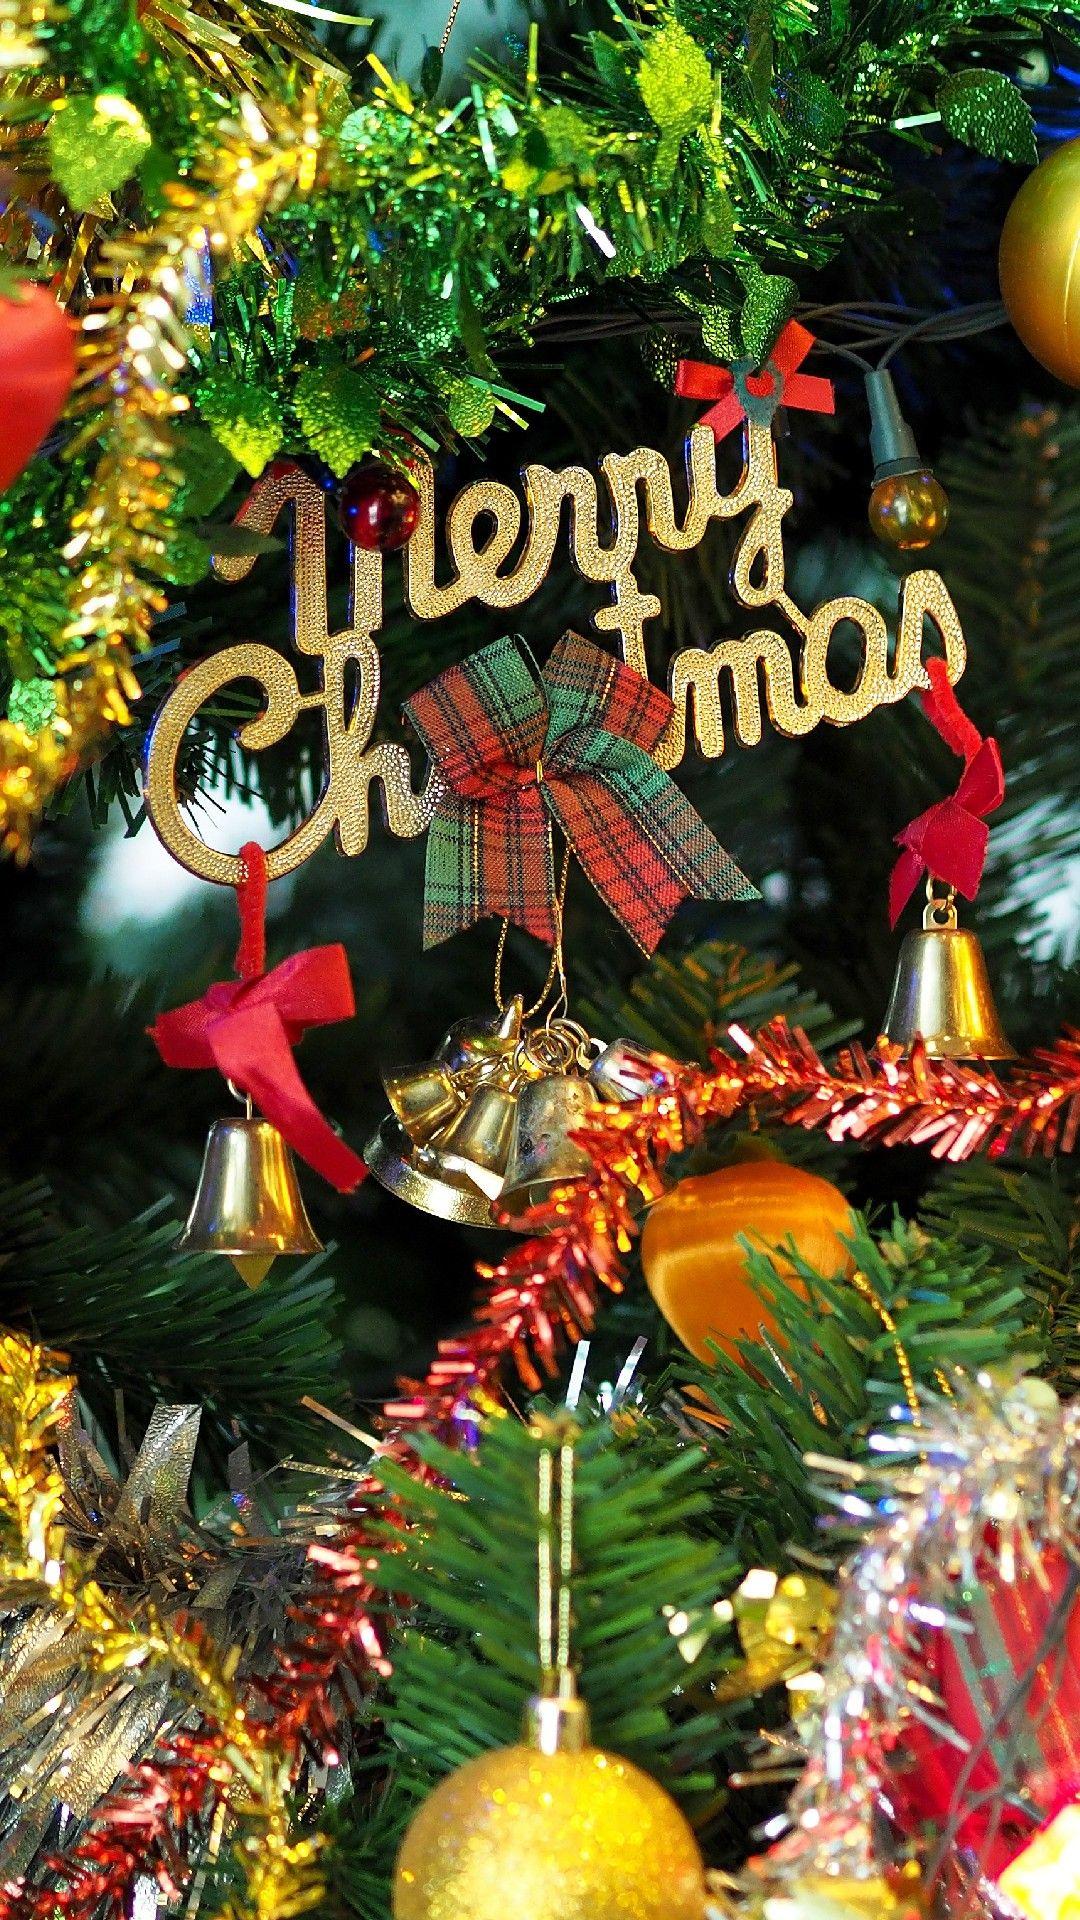 Merry Christmas Phone Wallpaper Lockscreen HD 4K Android ...